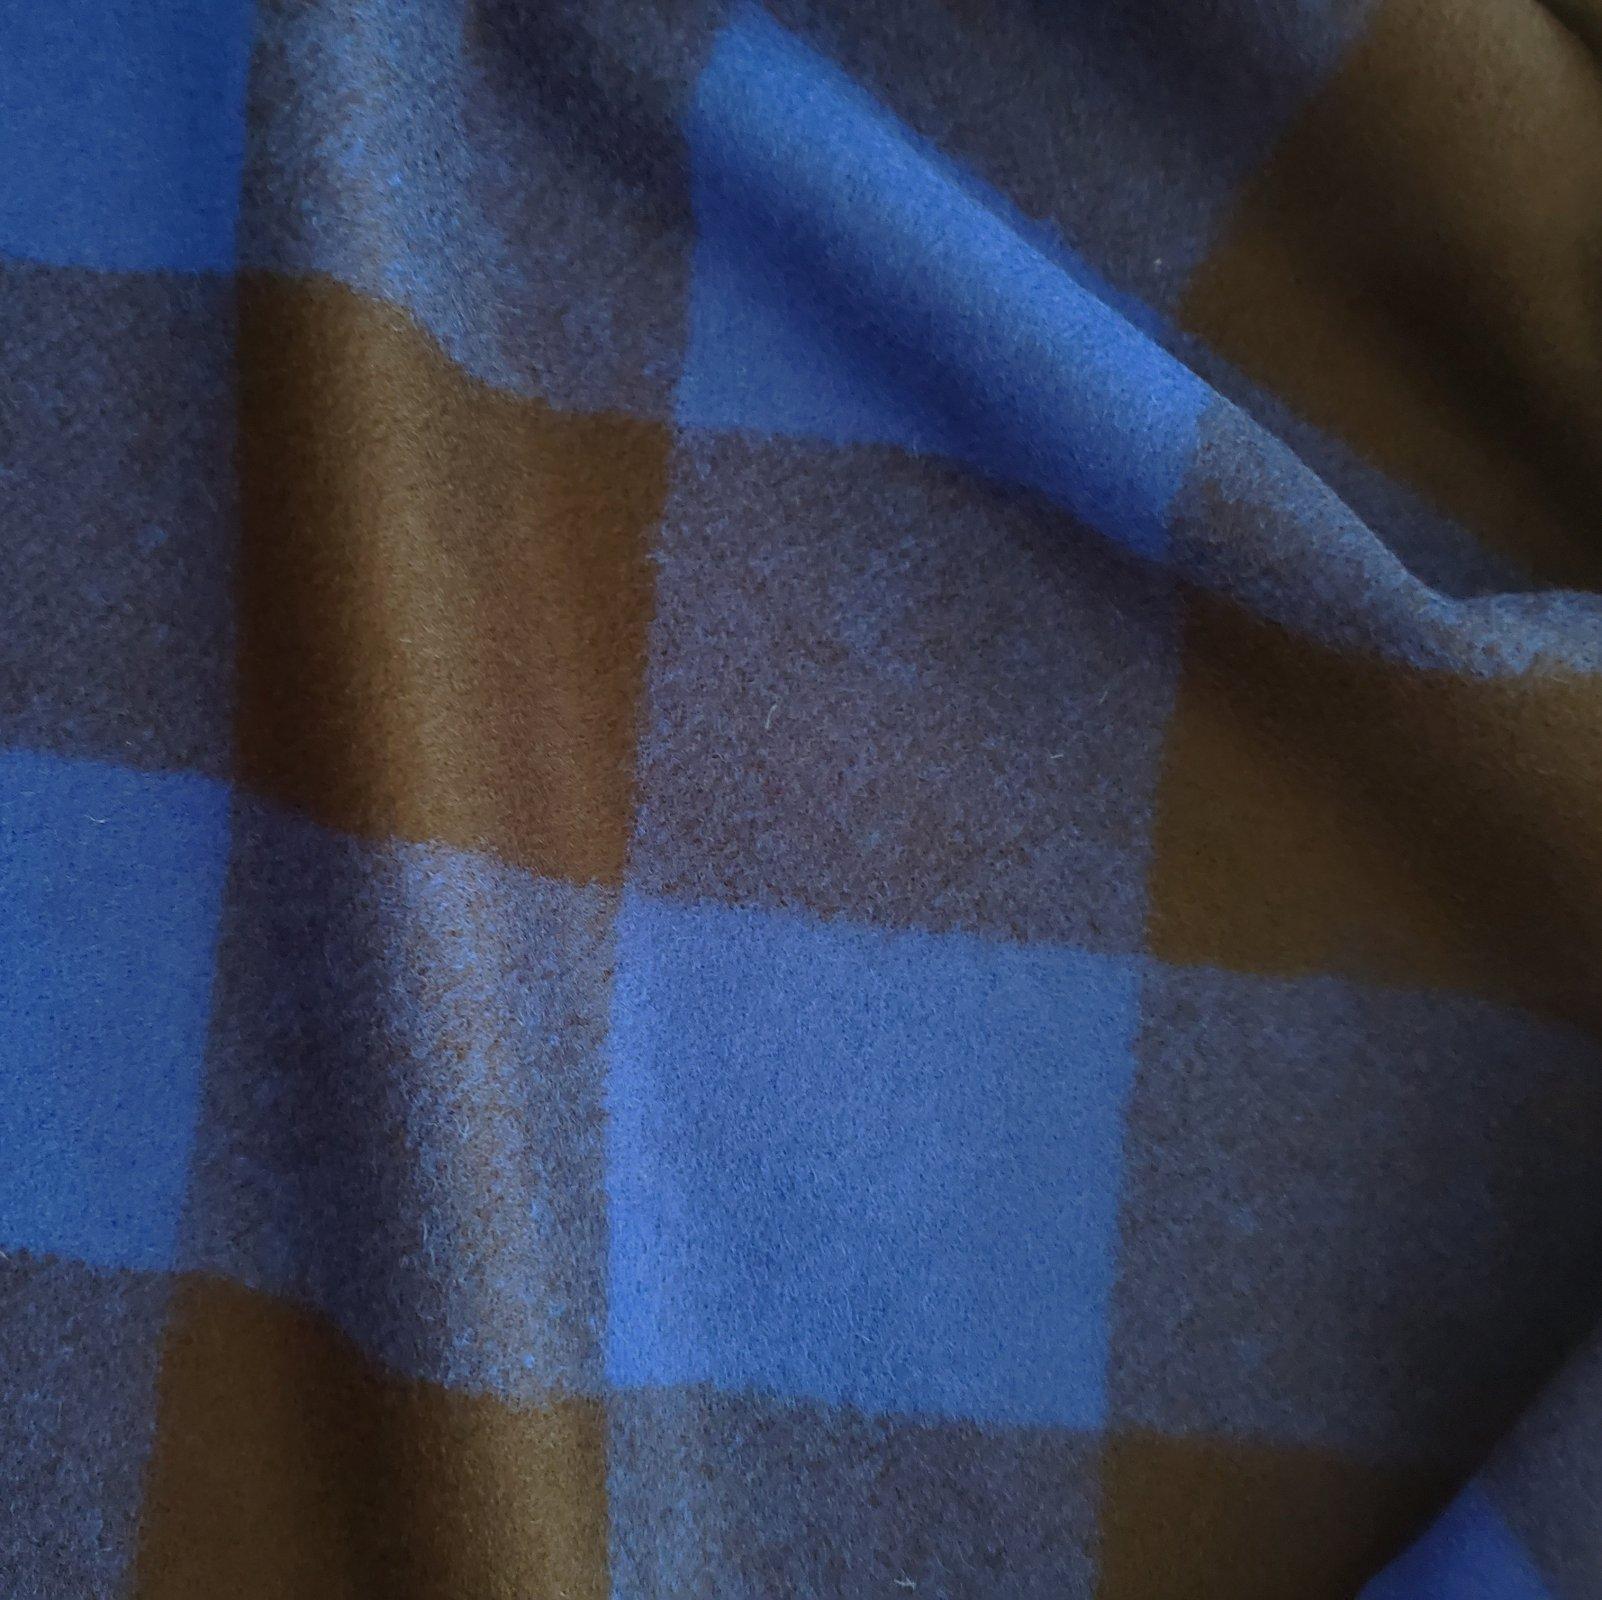 Fabric Wool Coating Blue/Black Large Buffalo Check